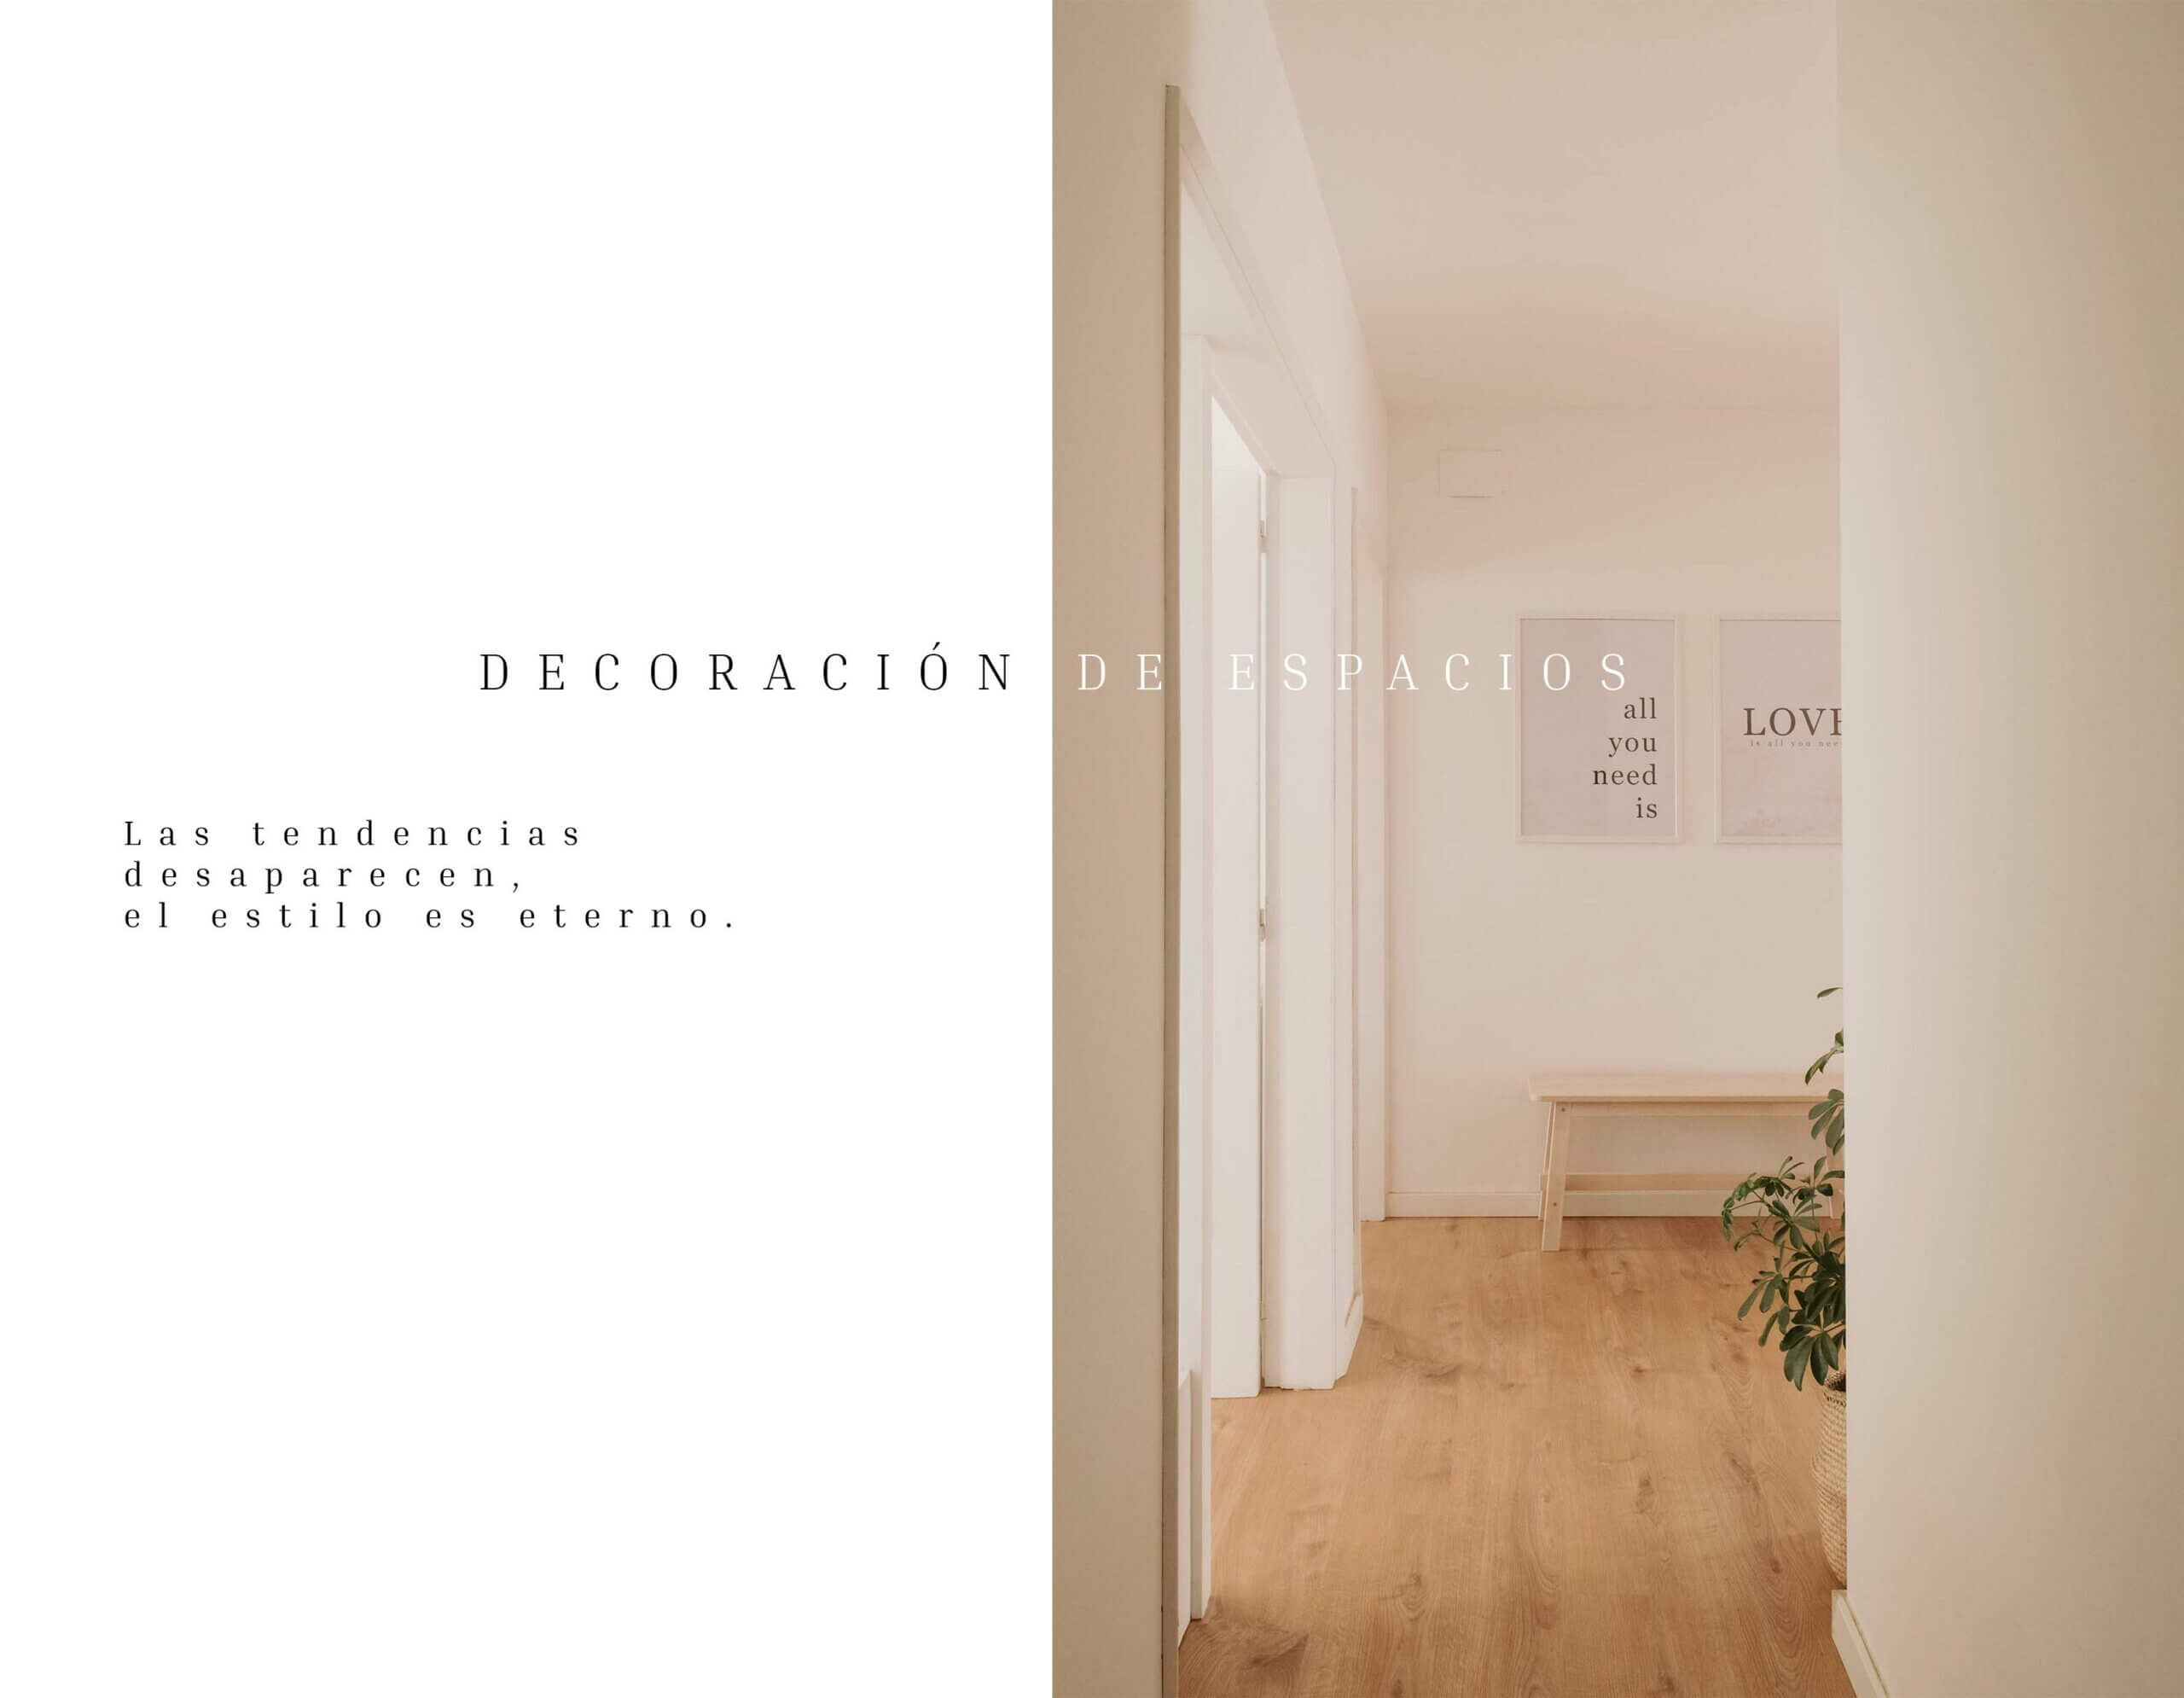 Decoración de espacios